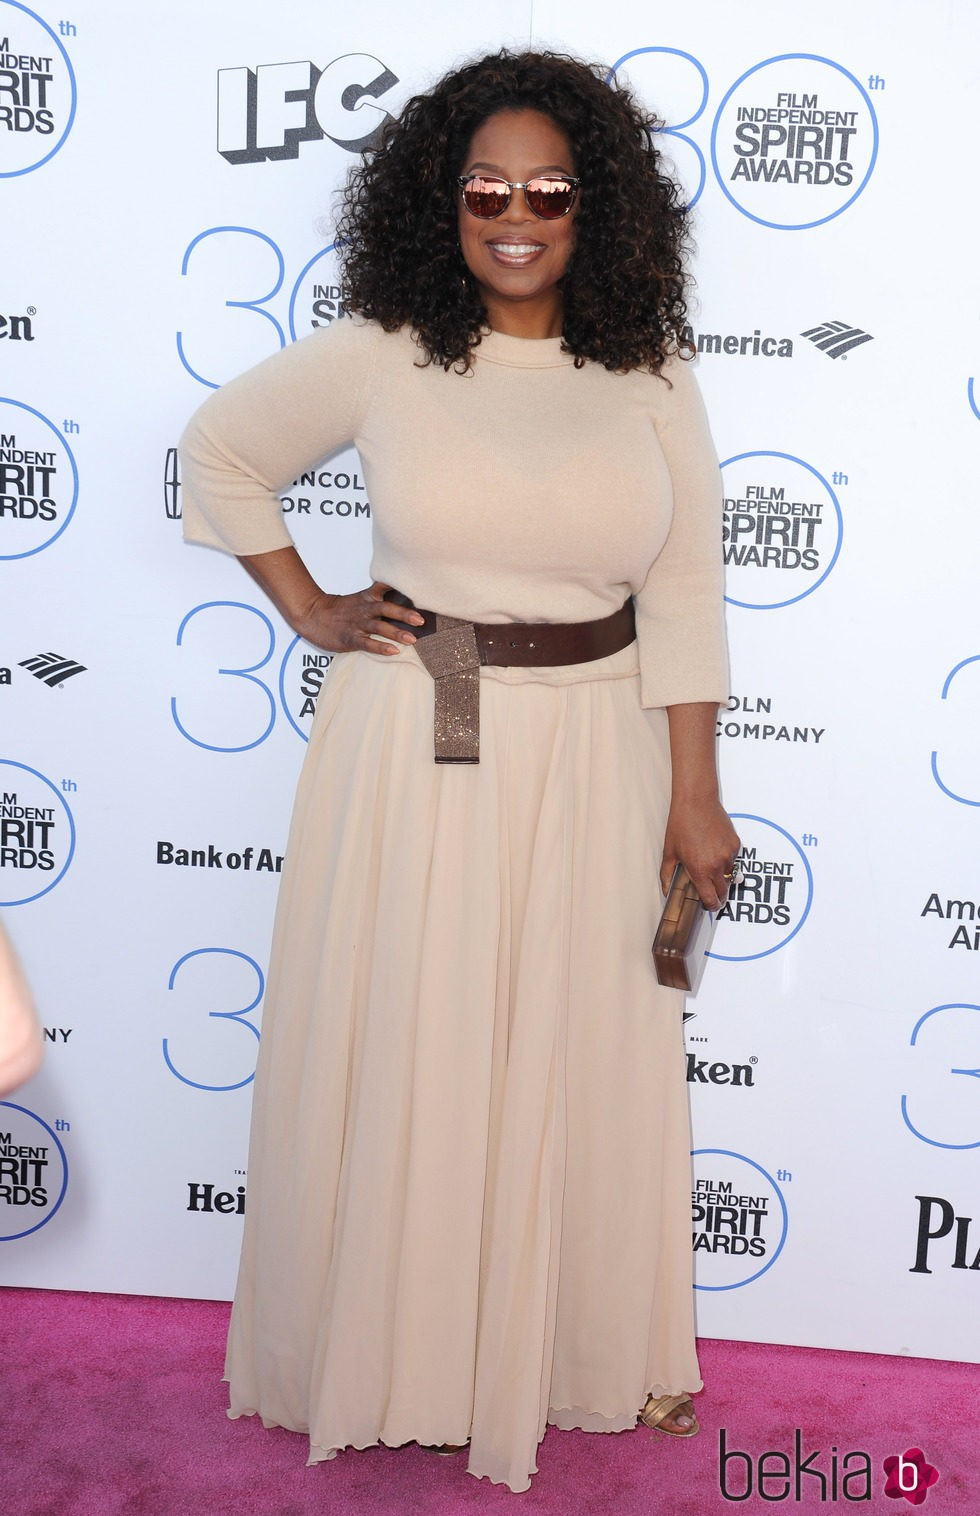 Oprah Winfrey en los Independent Spirit Awards 2015